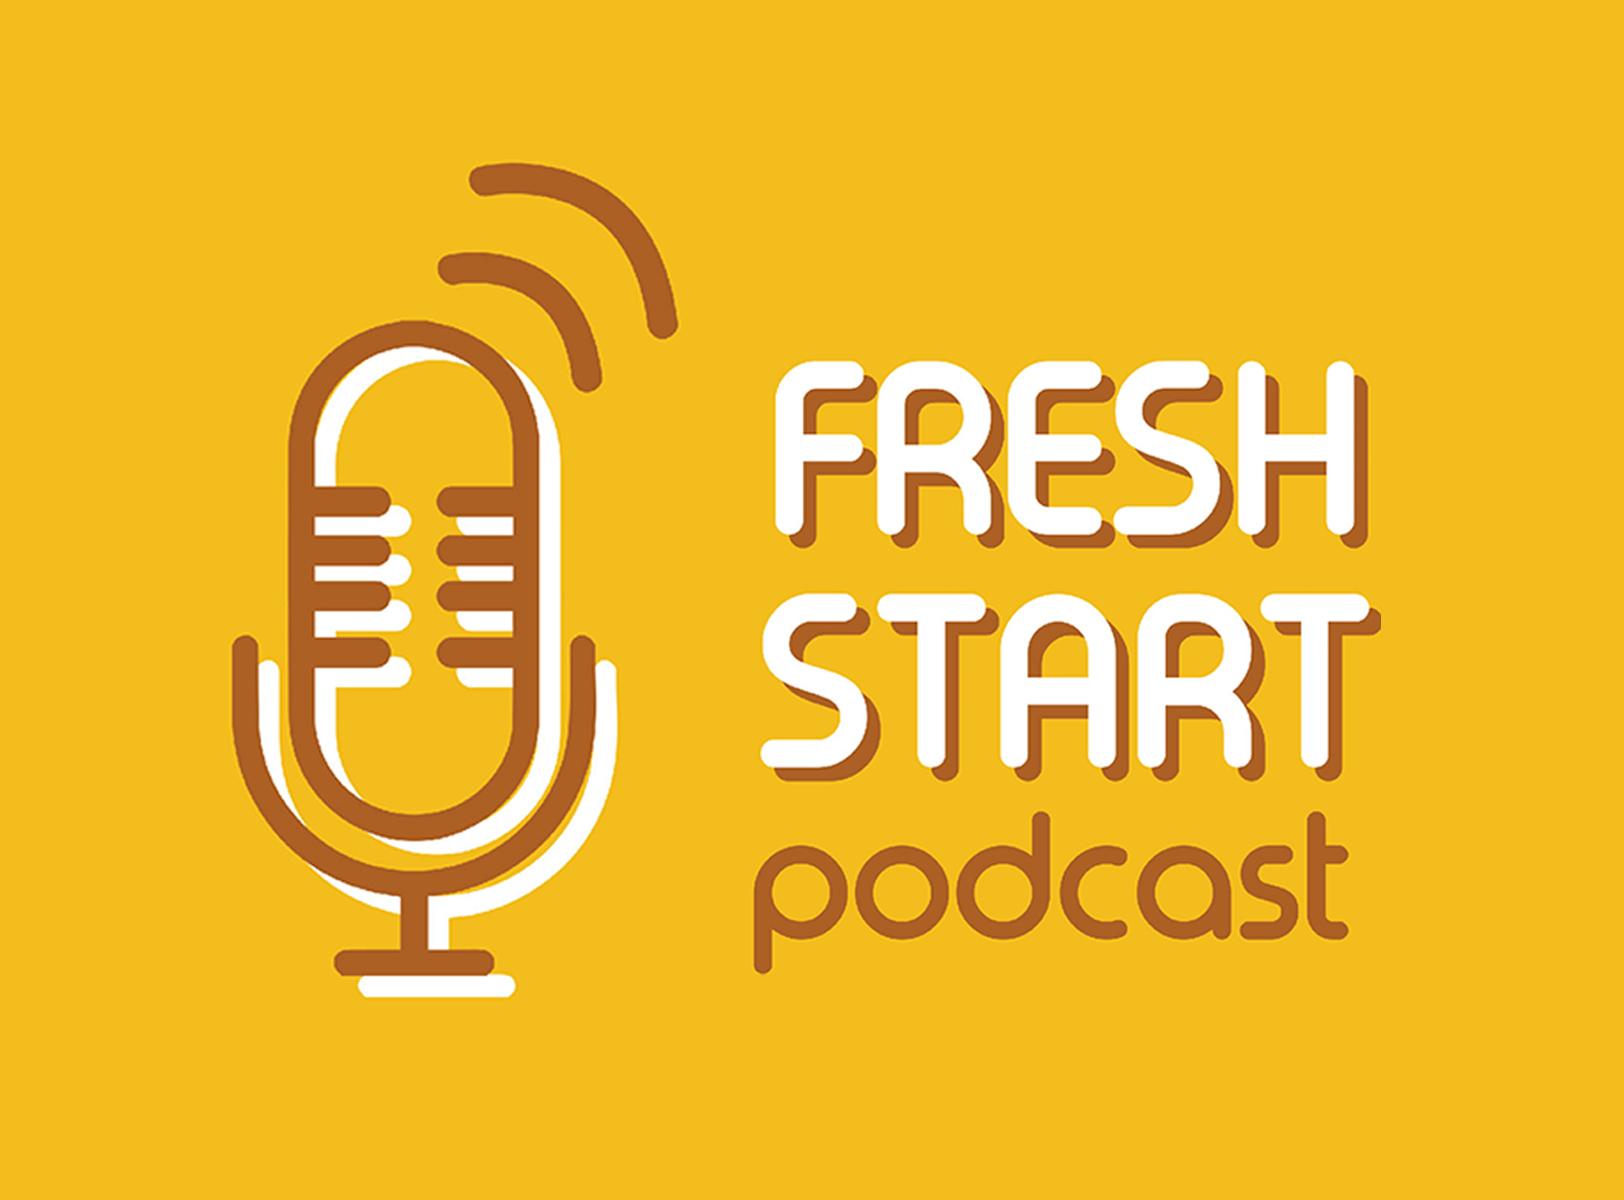 Fresh Start: Podcast News (11/22/2018 Thu.)